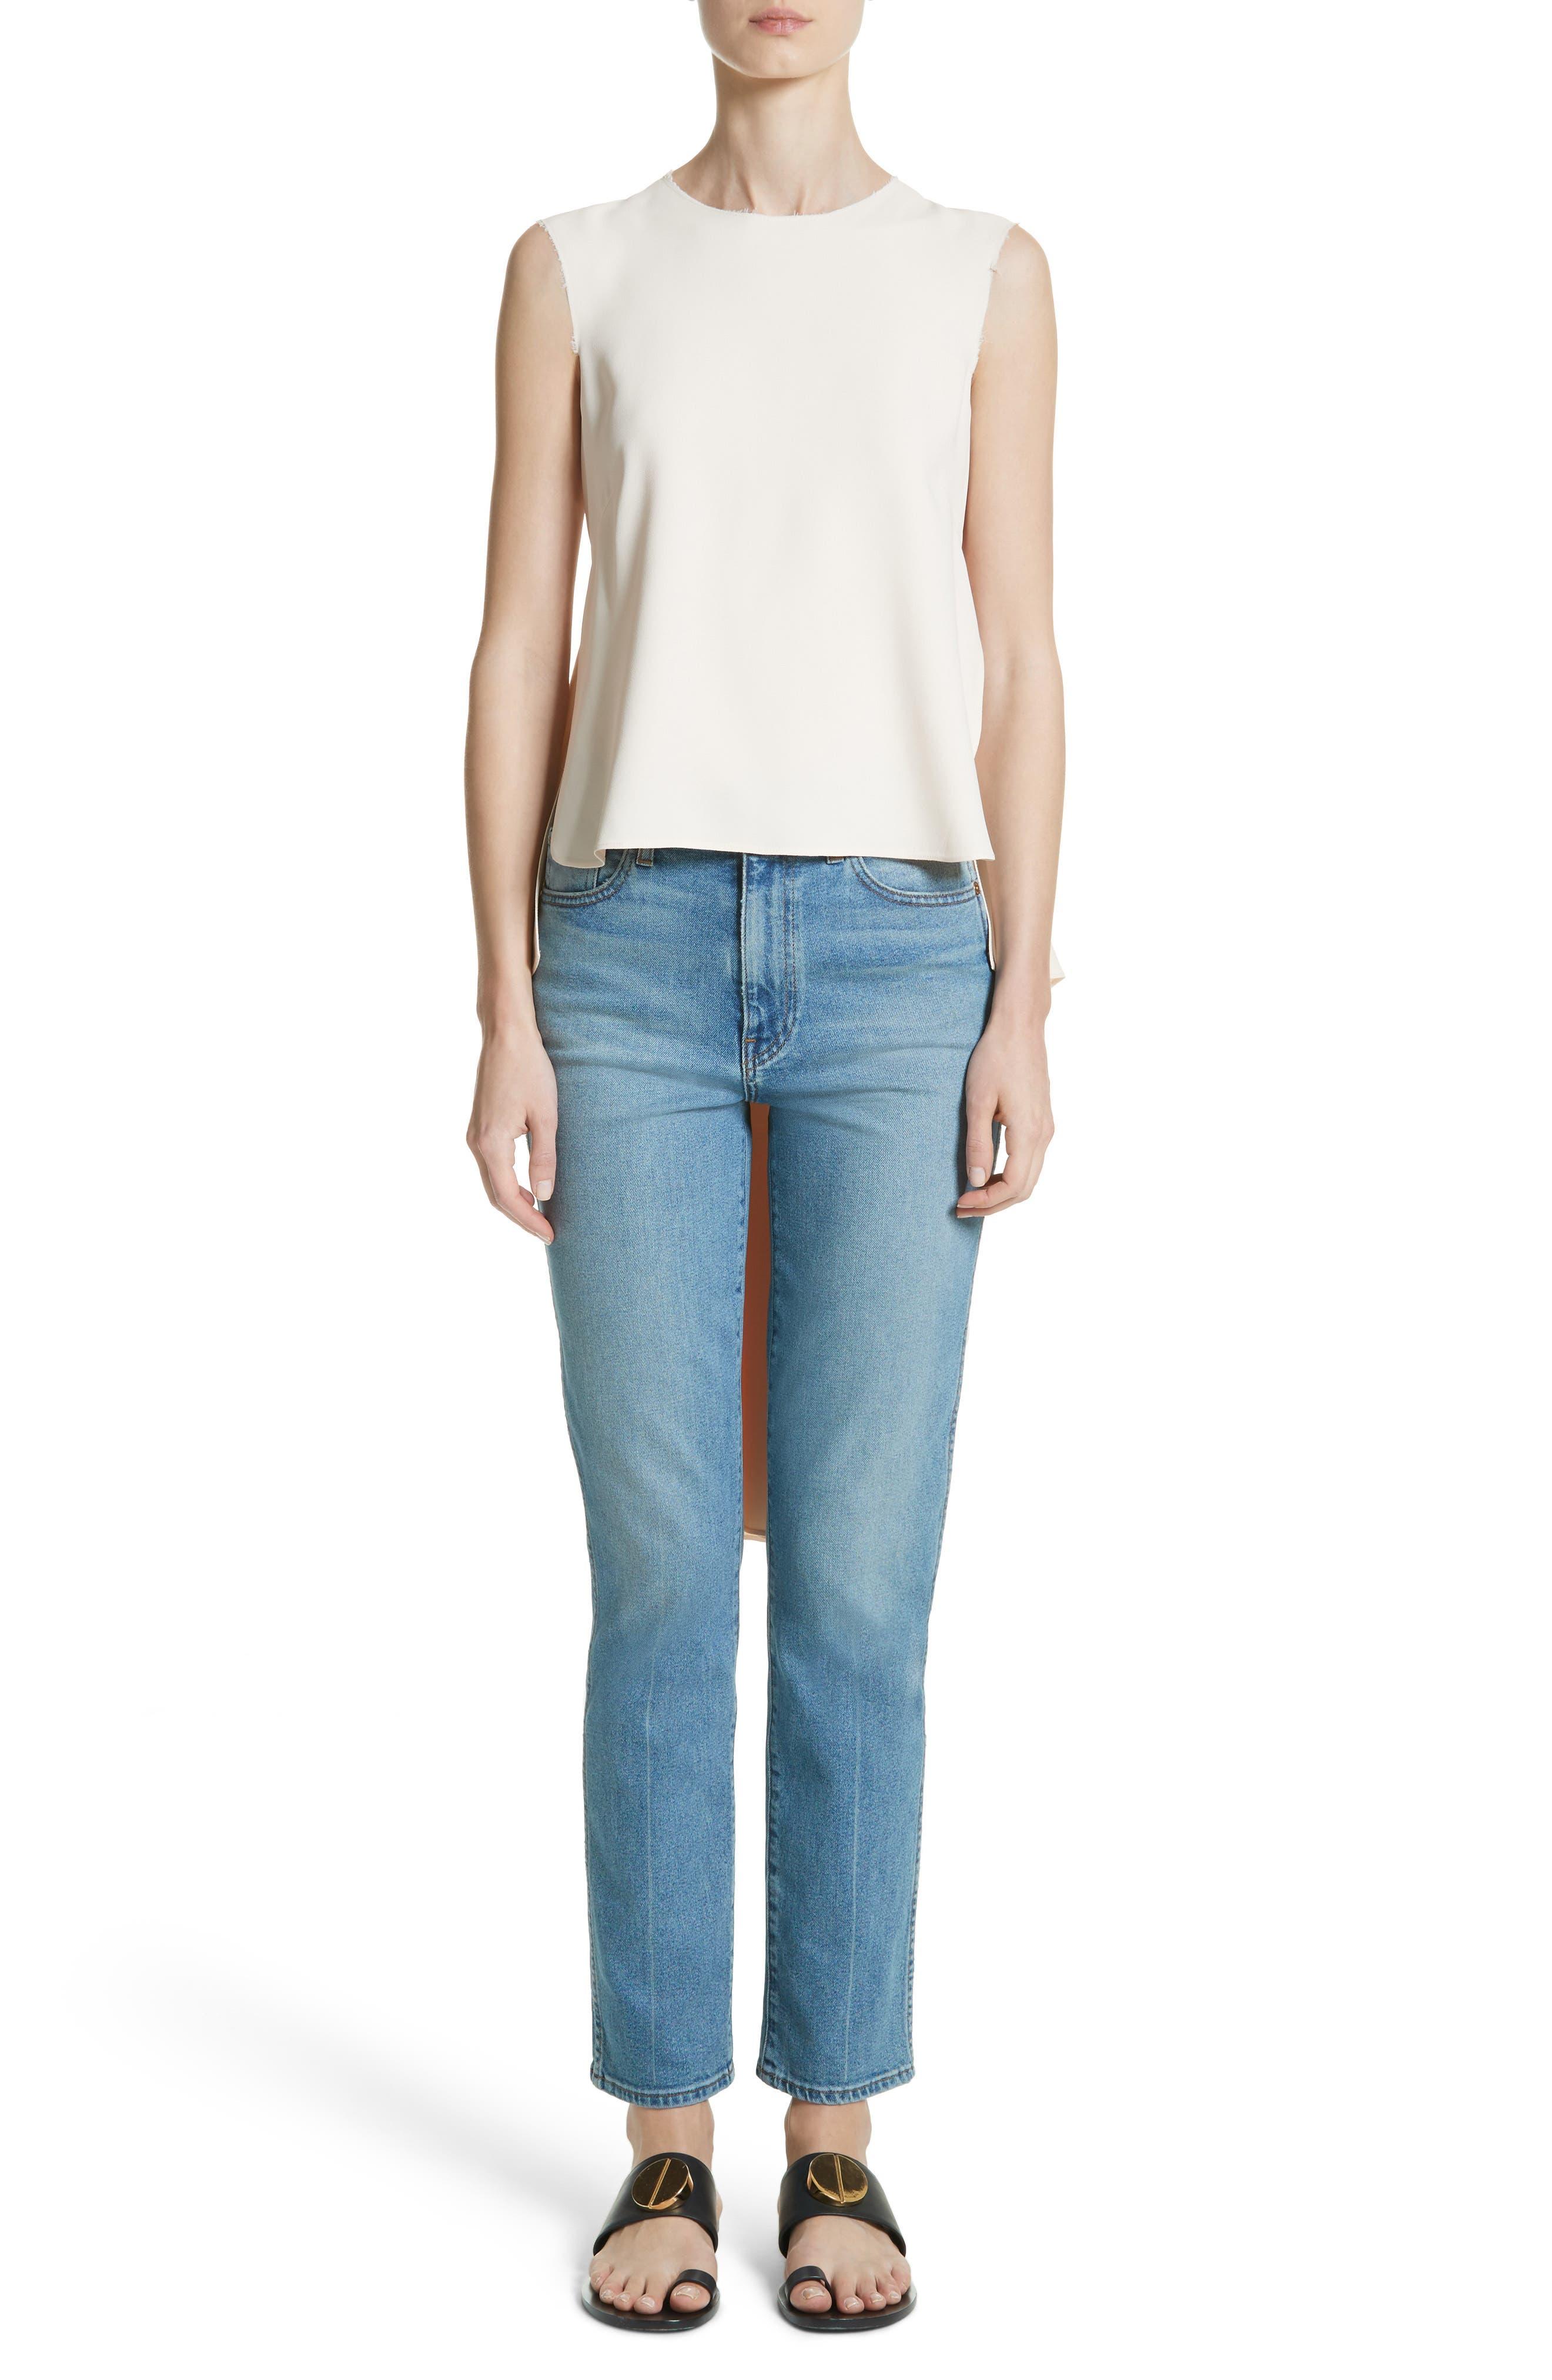 Victoria Straight Leg Jeans,                             Alternate thumbnail 9, color,                             Medium Crease